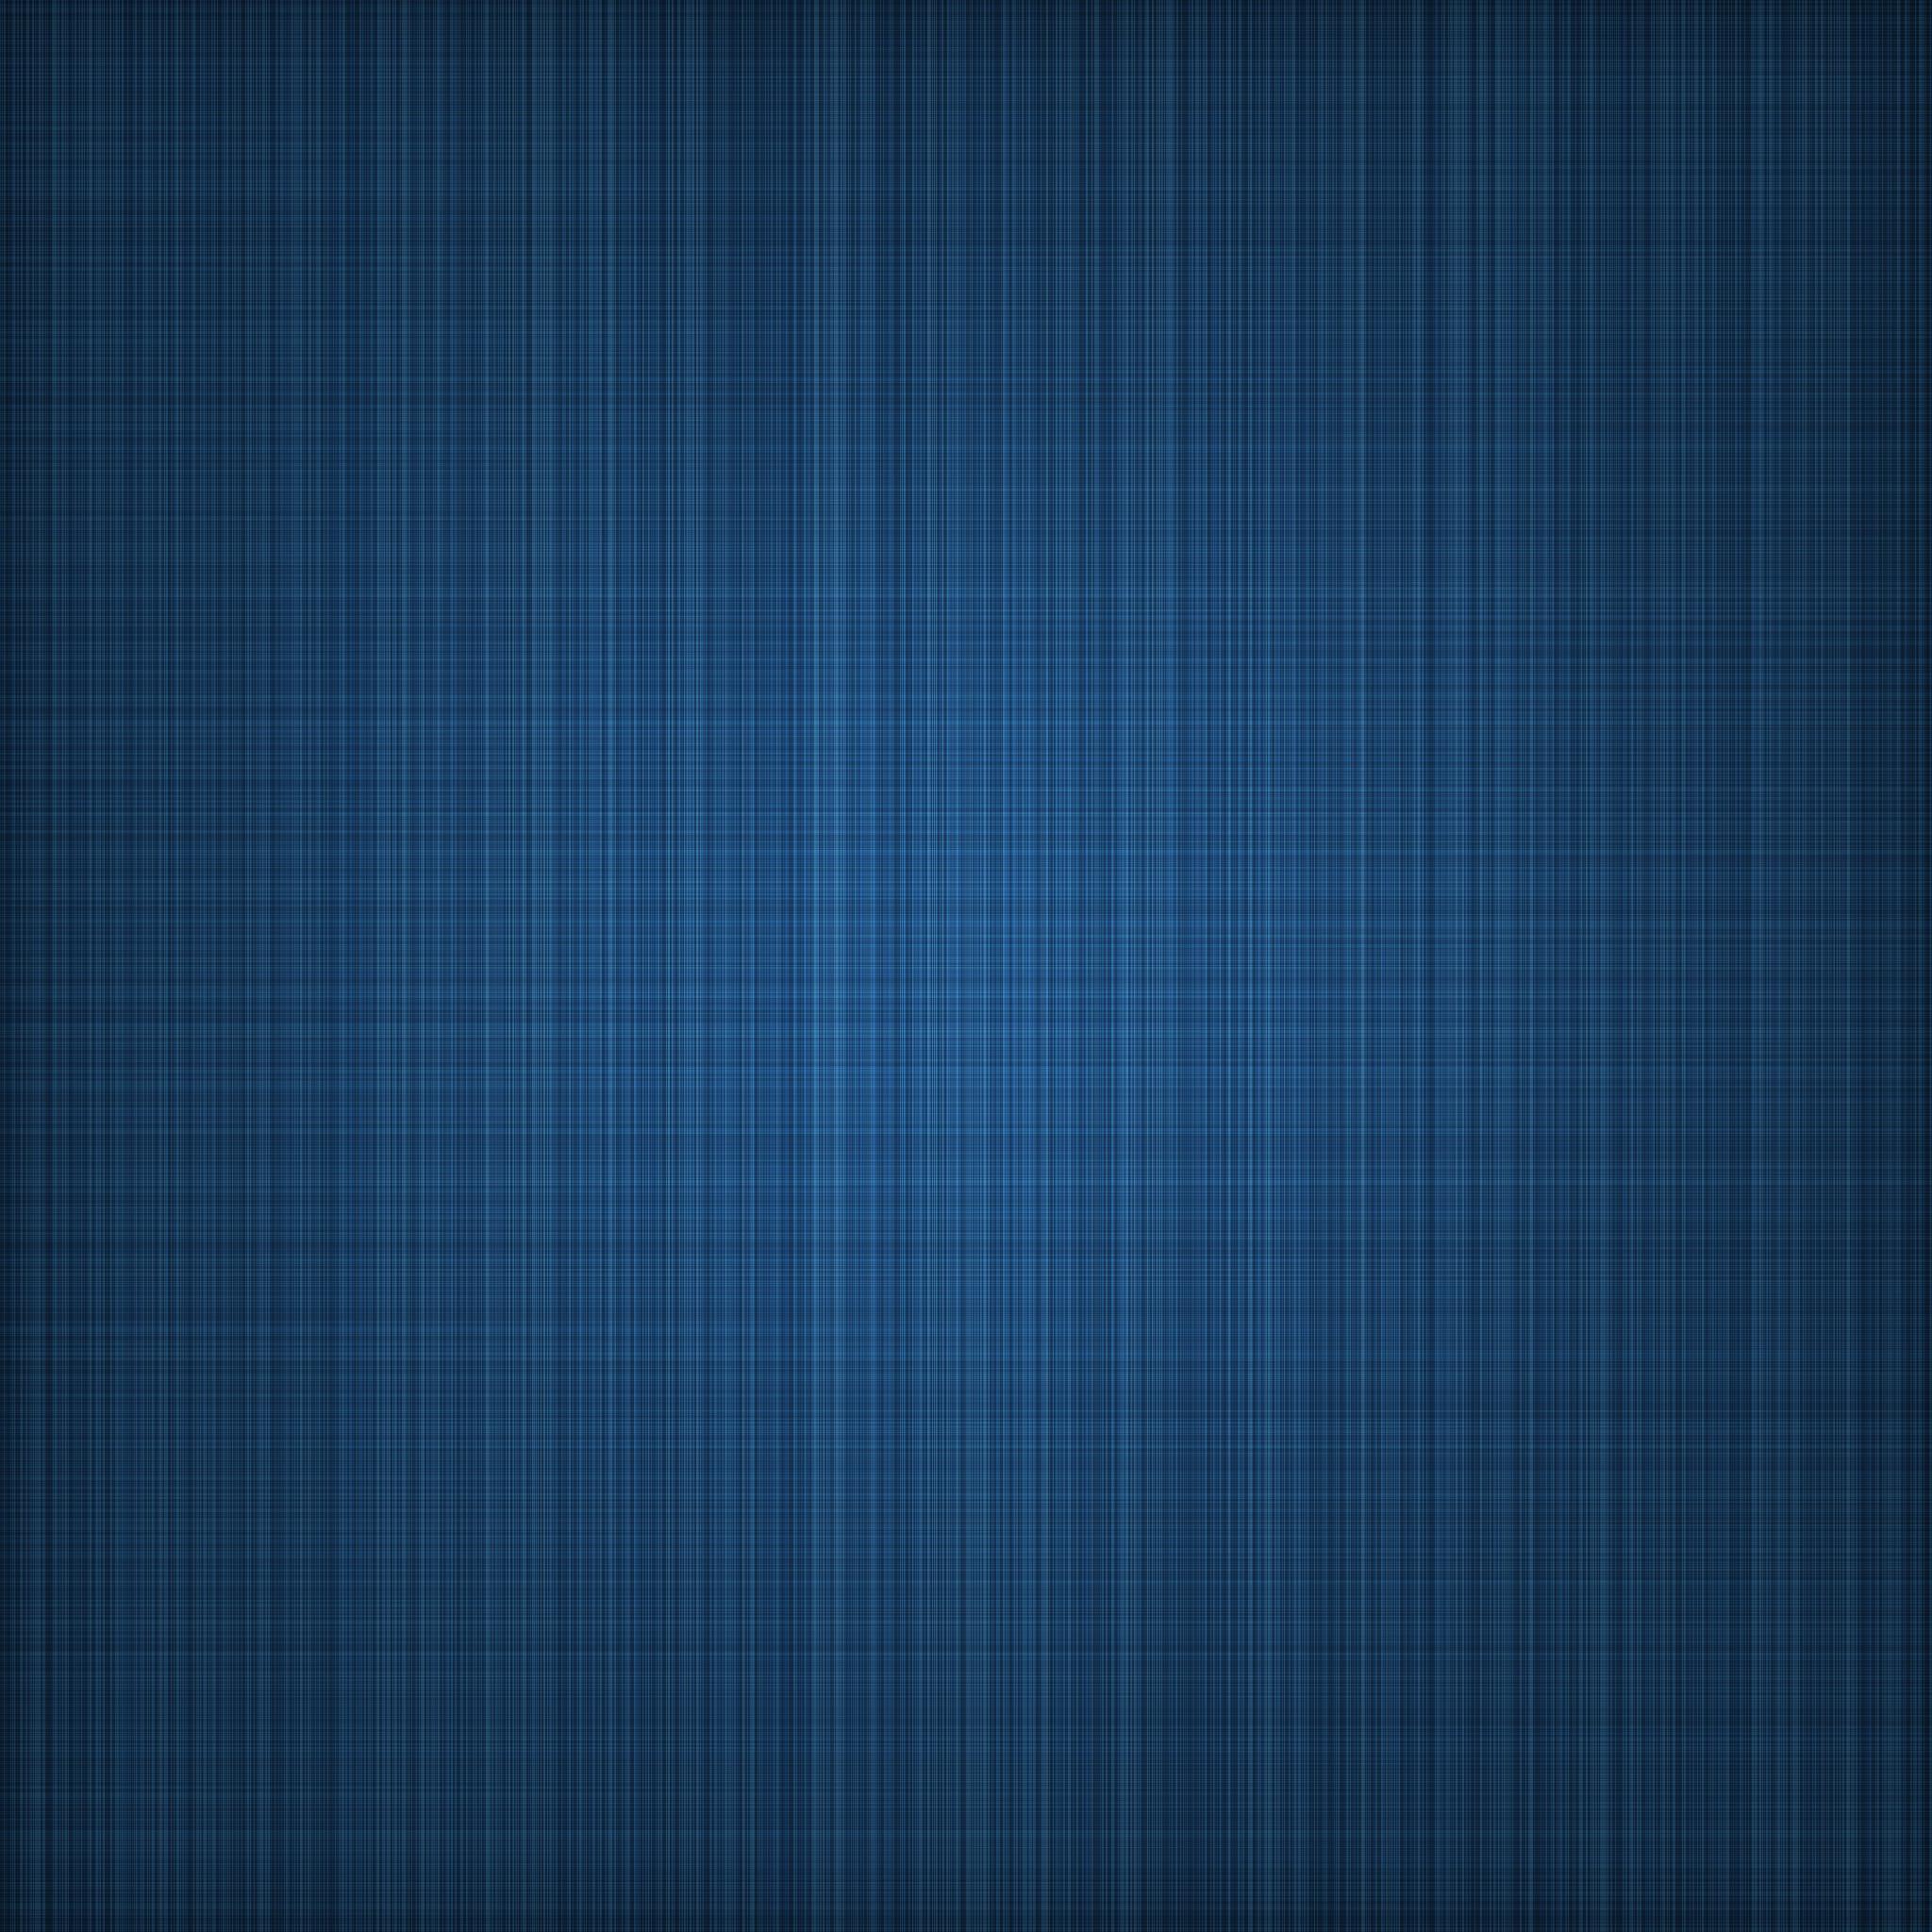 iPad Retina Wallpapers HD - Retina ready, stunning wallpapers